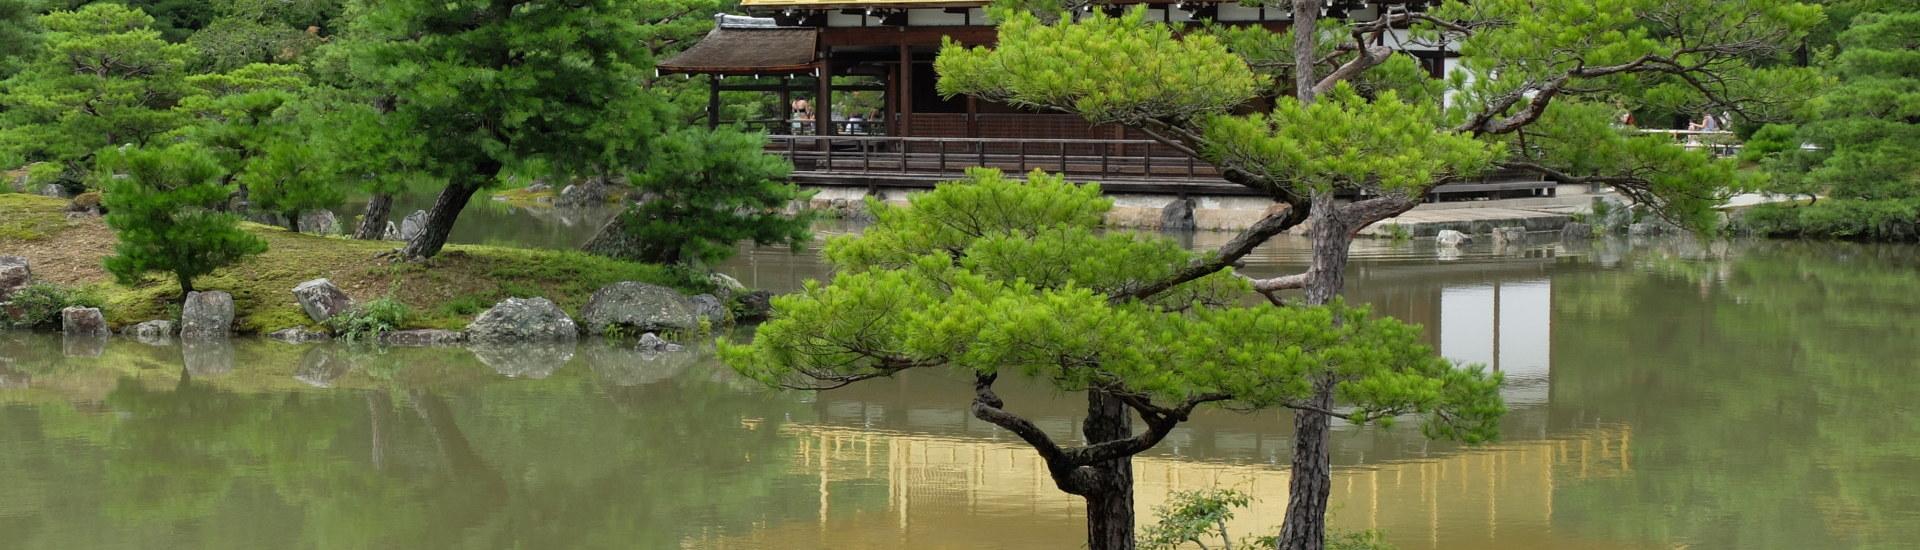 Kyoto Osaka Juillet 2015 (6)